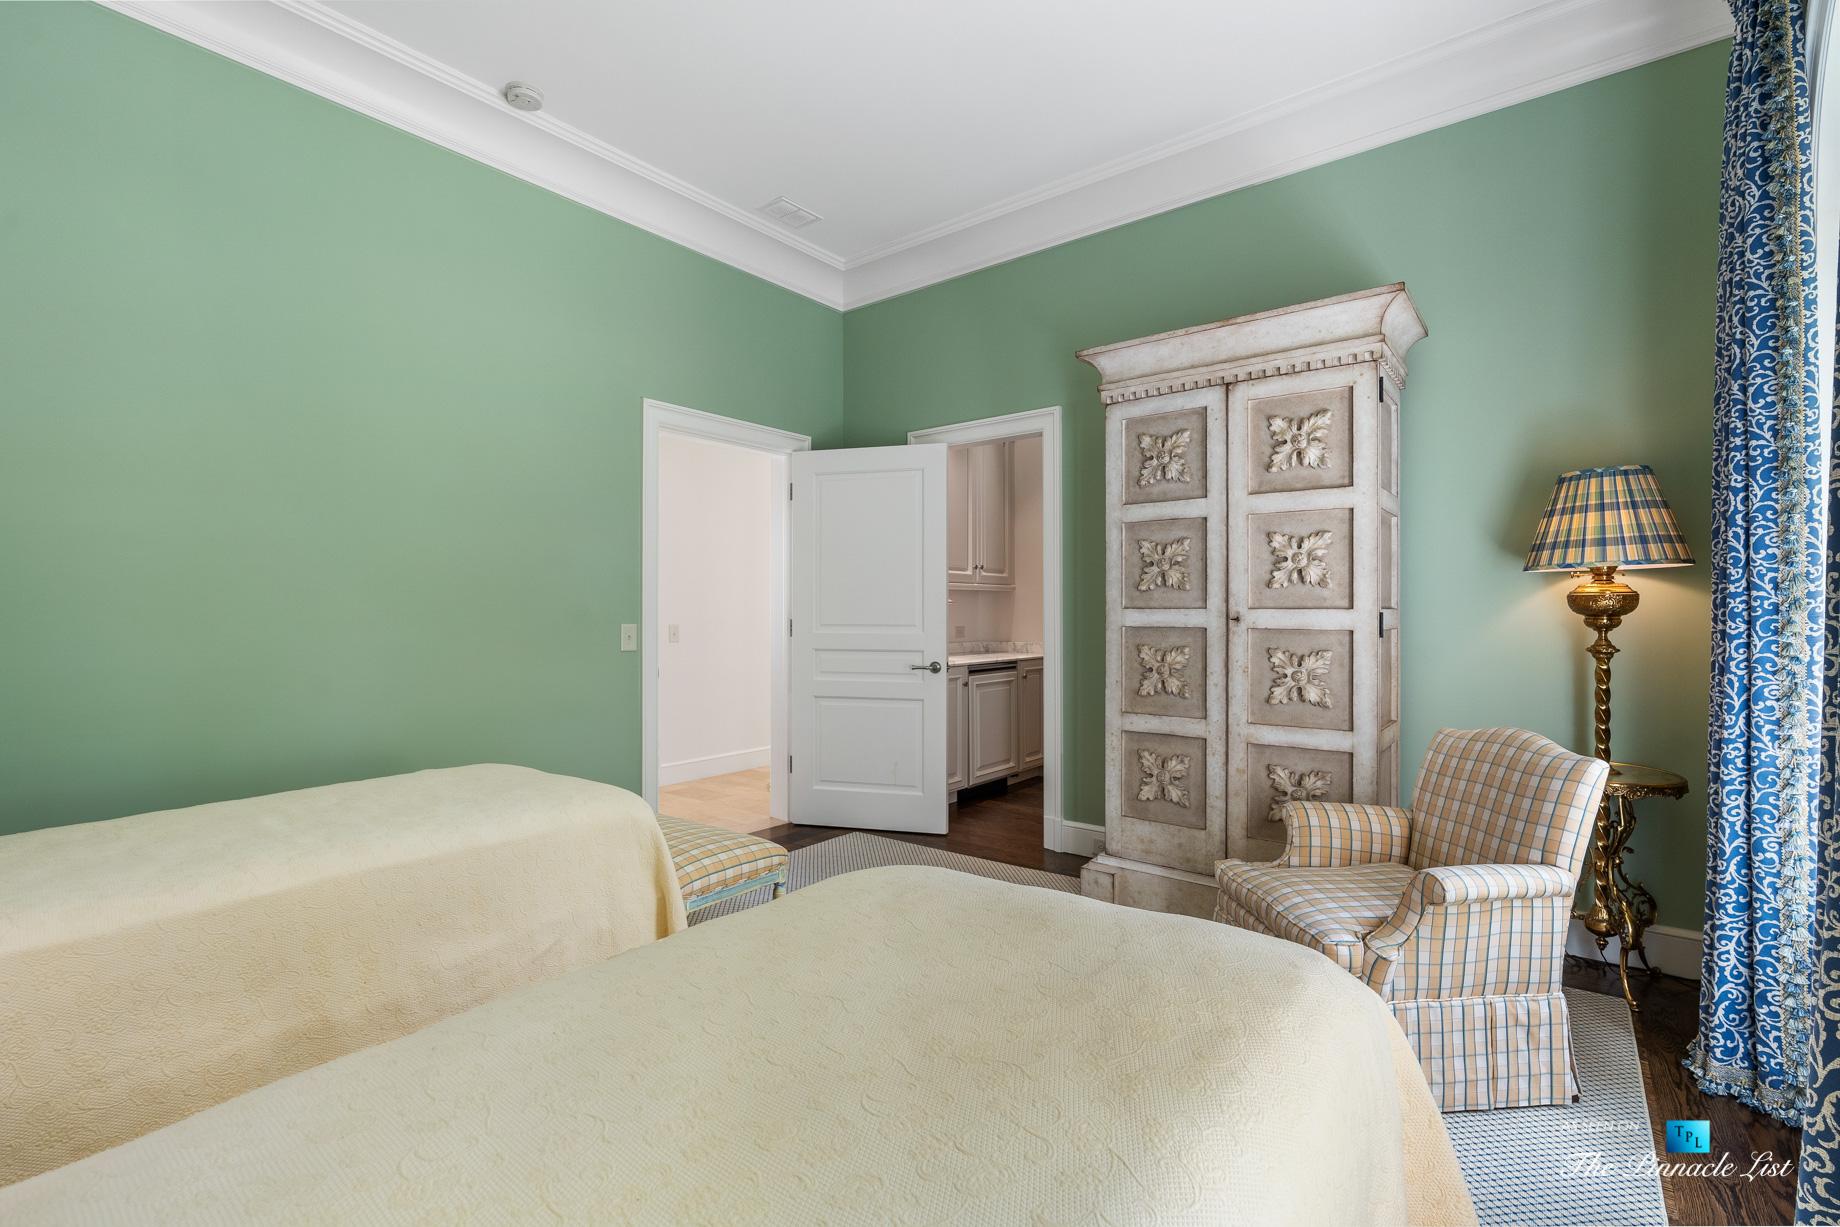 439 Blackland Rd NW, Atlanta, GA, USA – Bedroom – Luxury Real Estate – Tuxedo Park Mediterranean Mansion Home